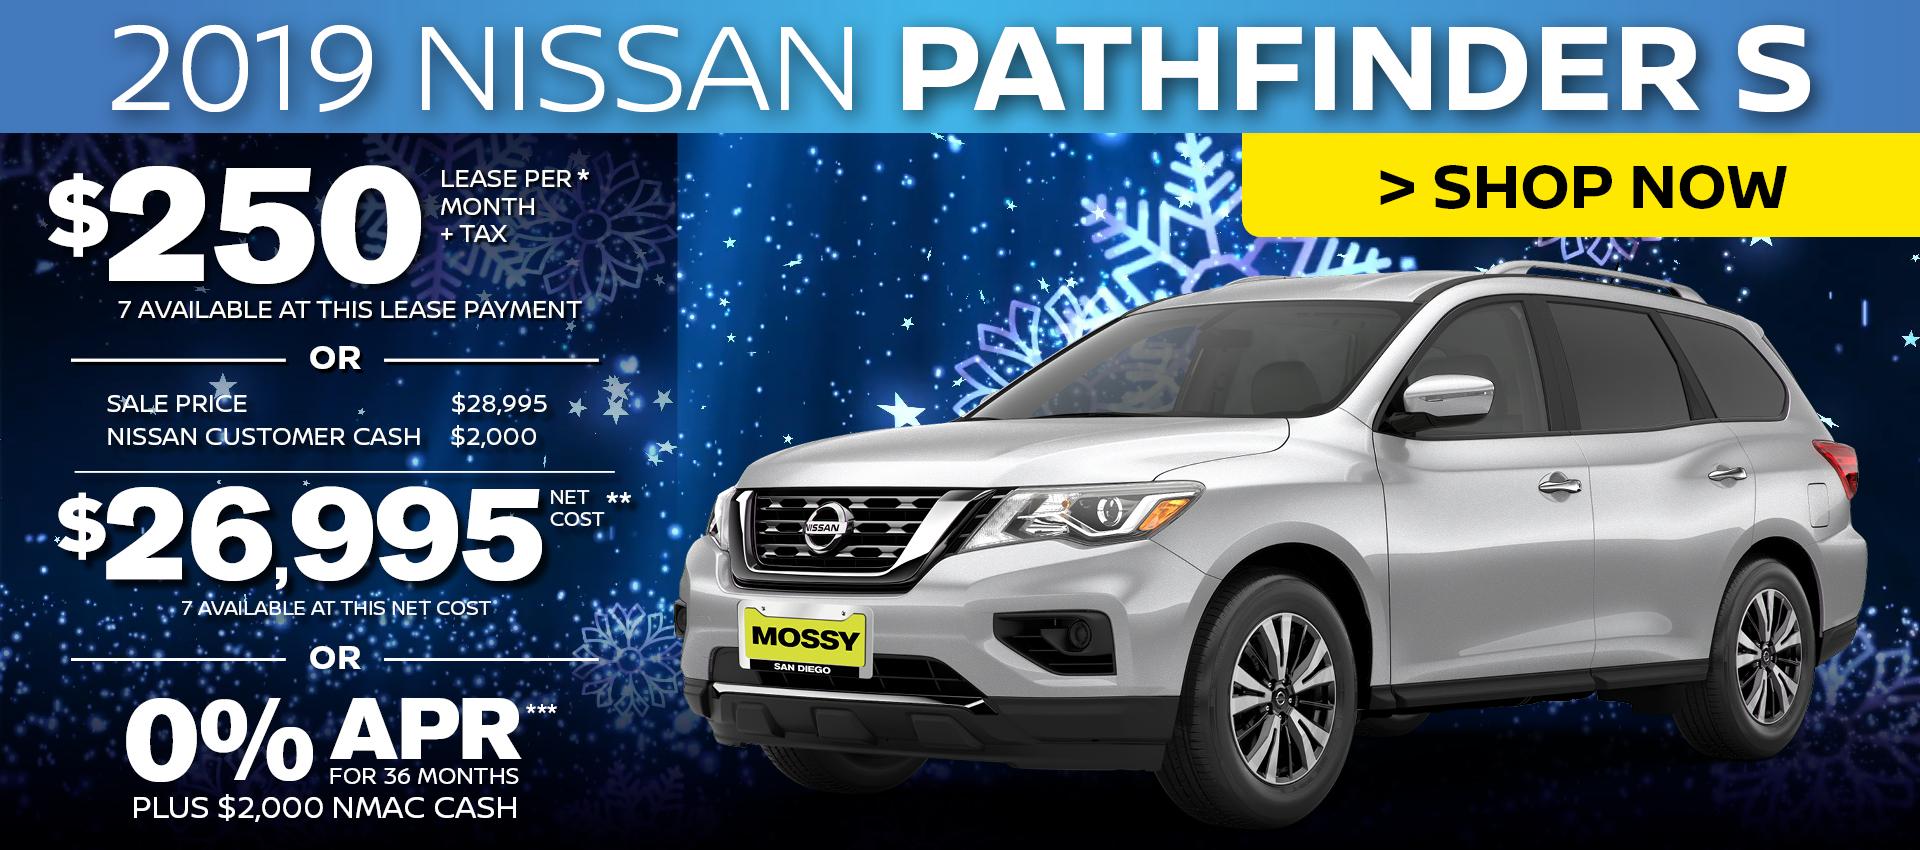 Mossy Nissan - Nissan Pathfinder $26,995 Purchase HP